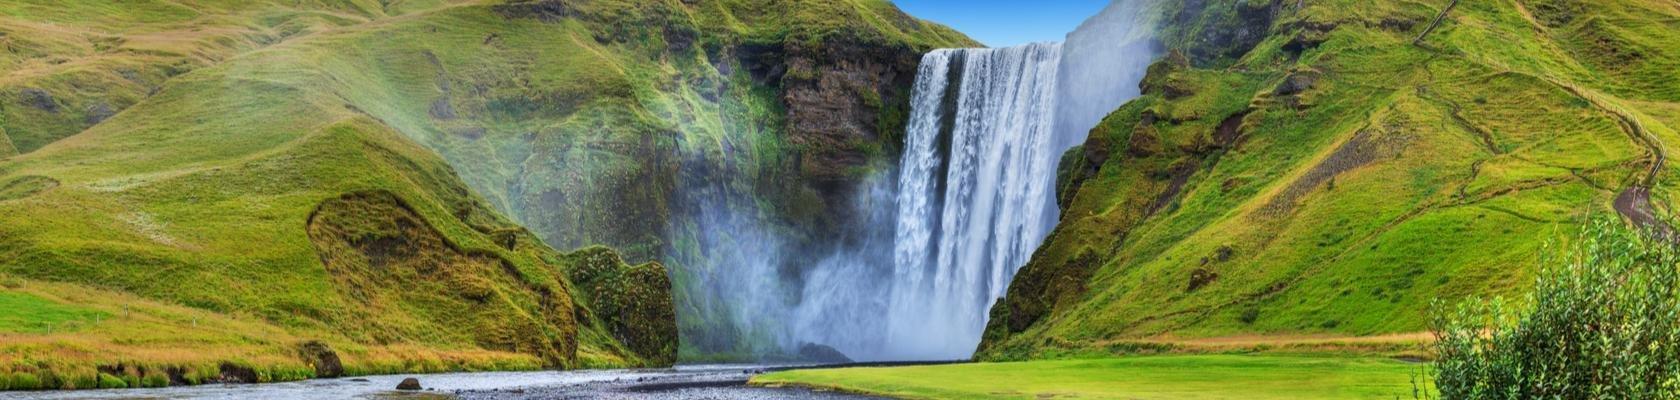 Seljalandsfoss-waterval